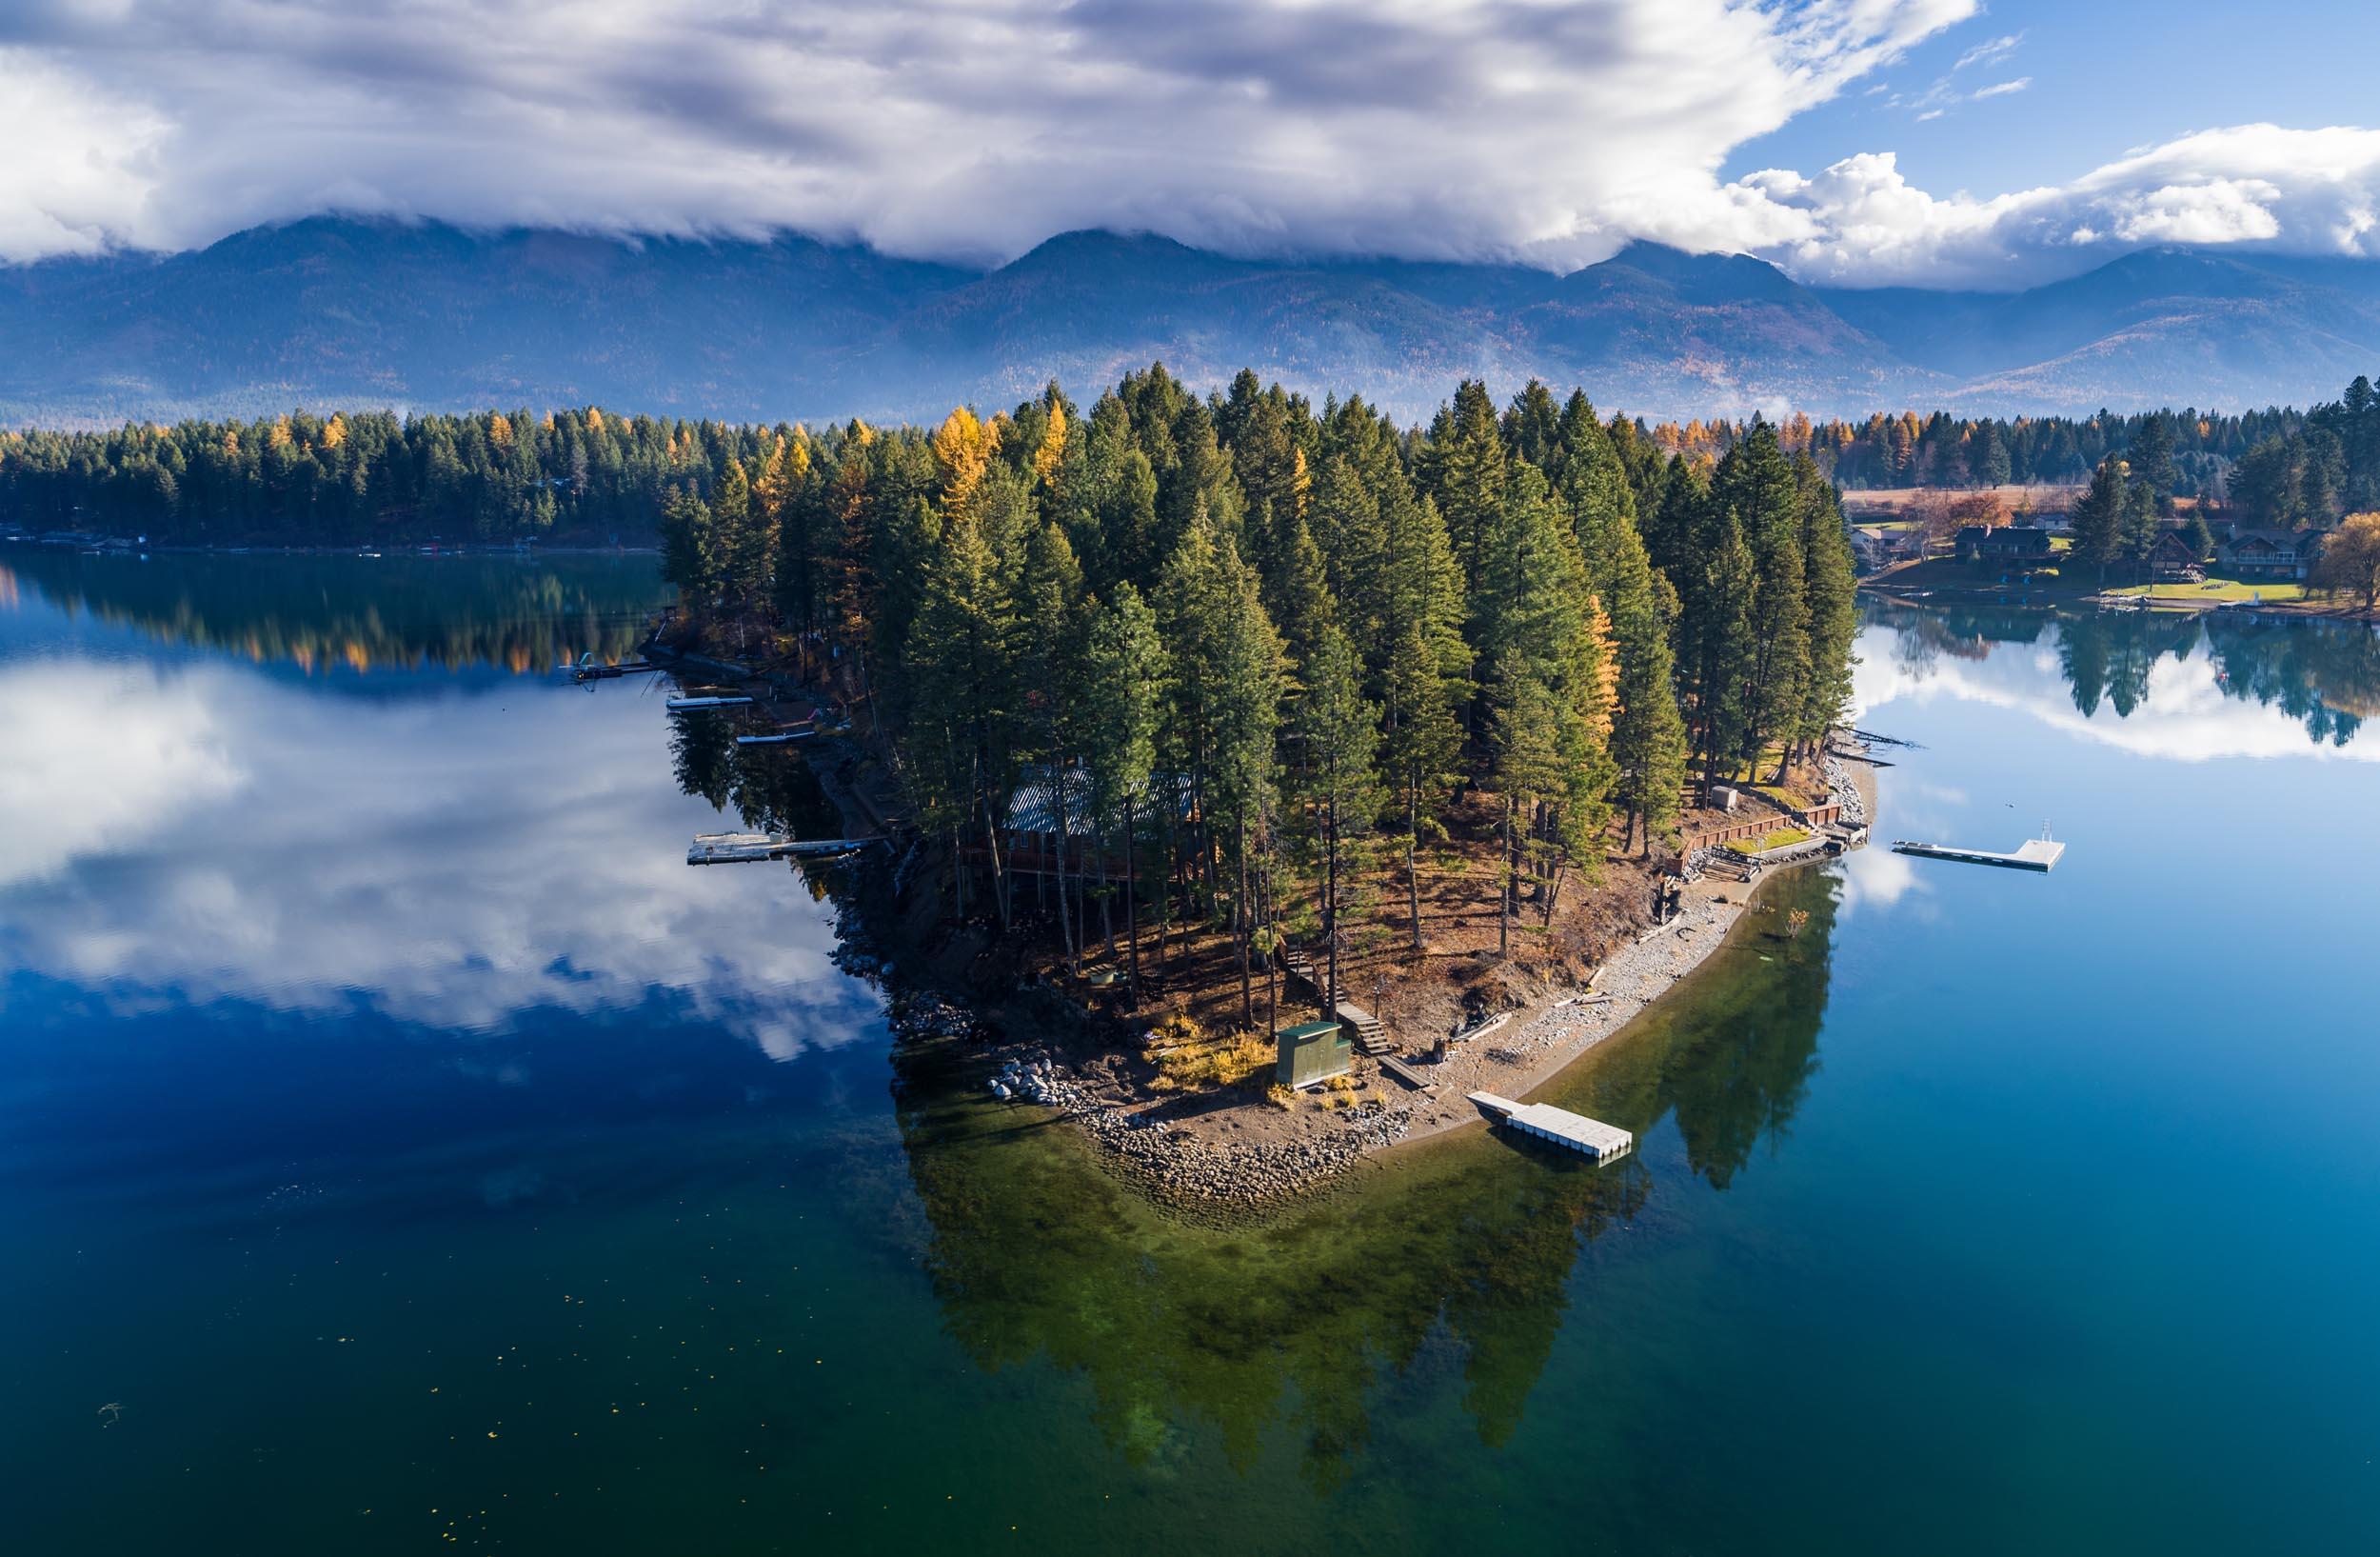 Deer Island, Echo Lake